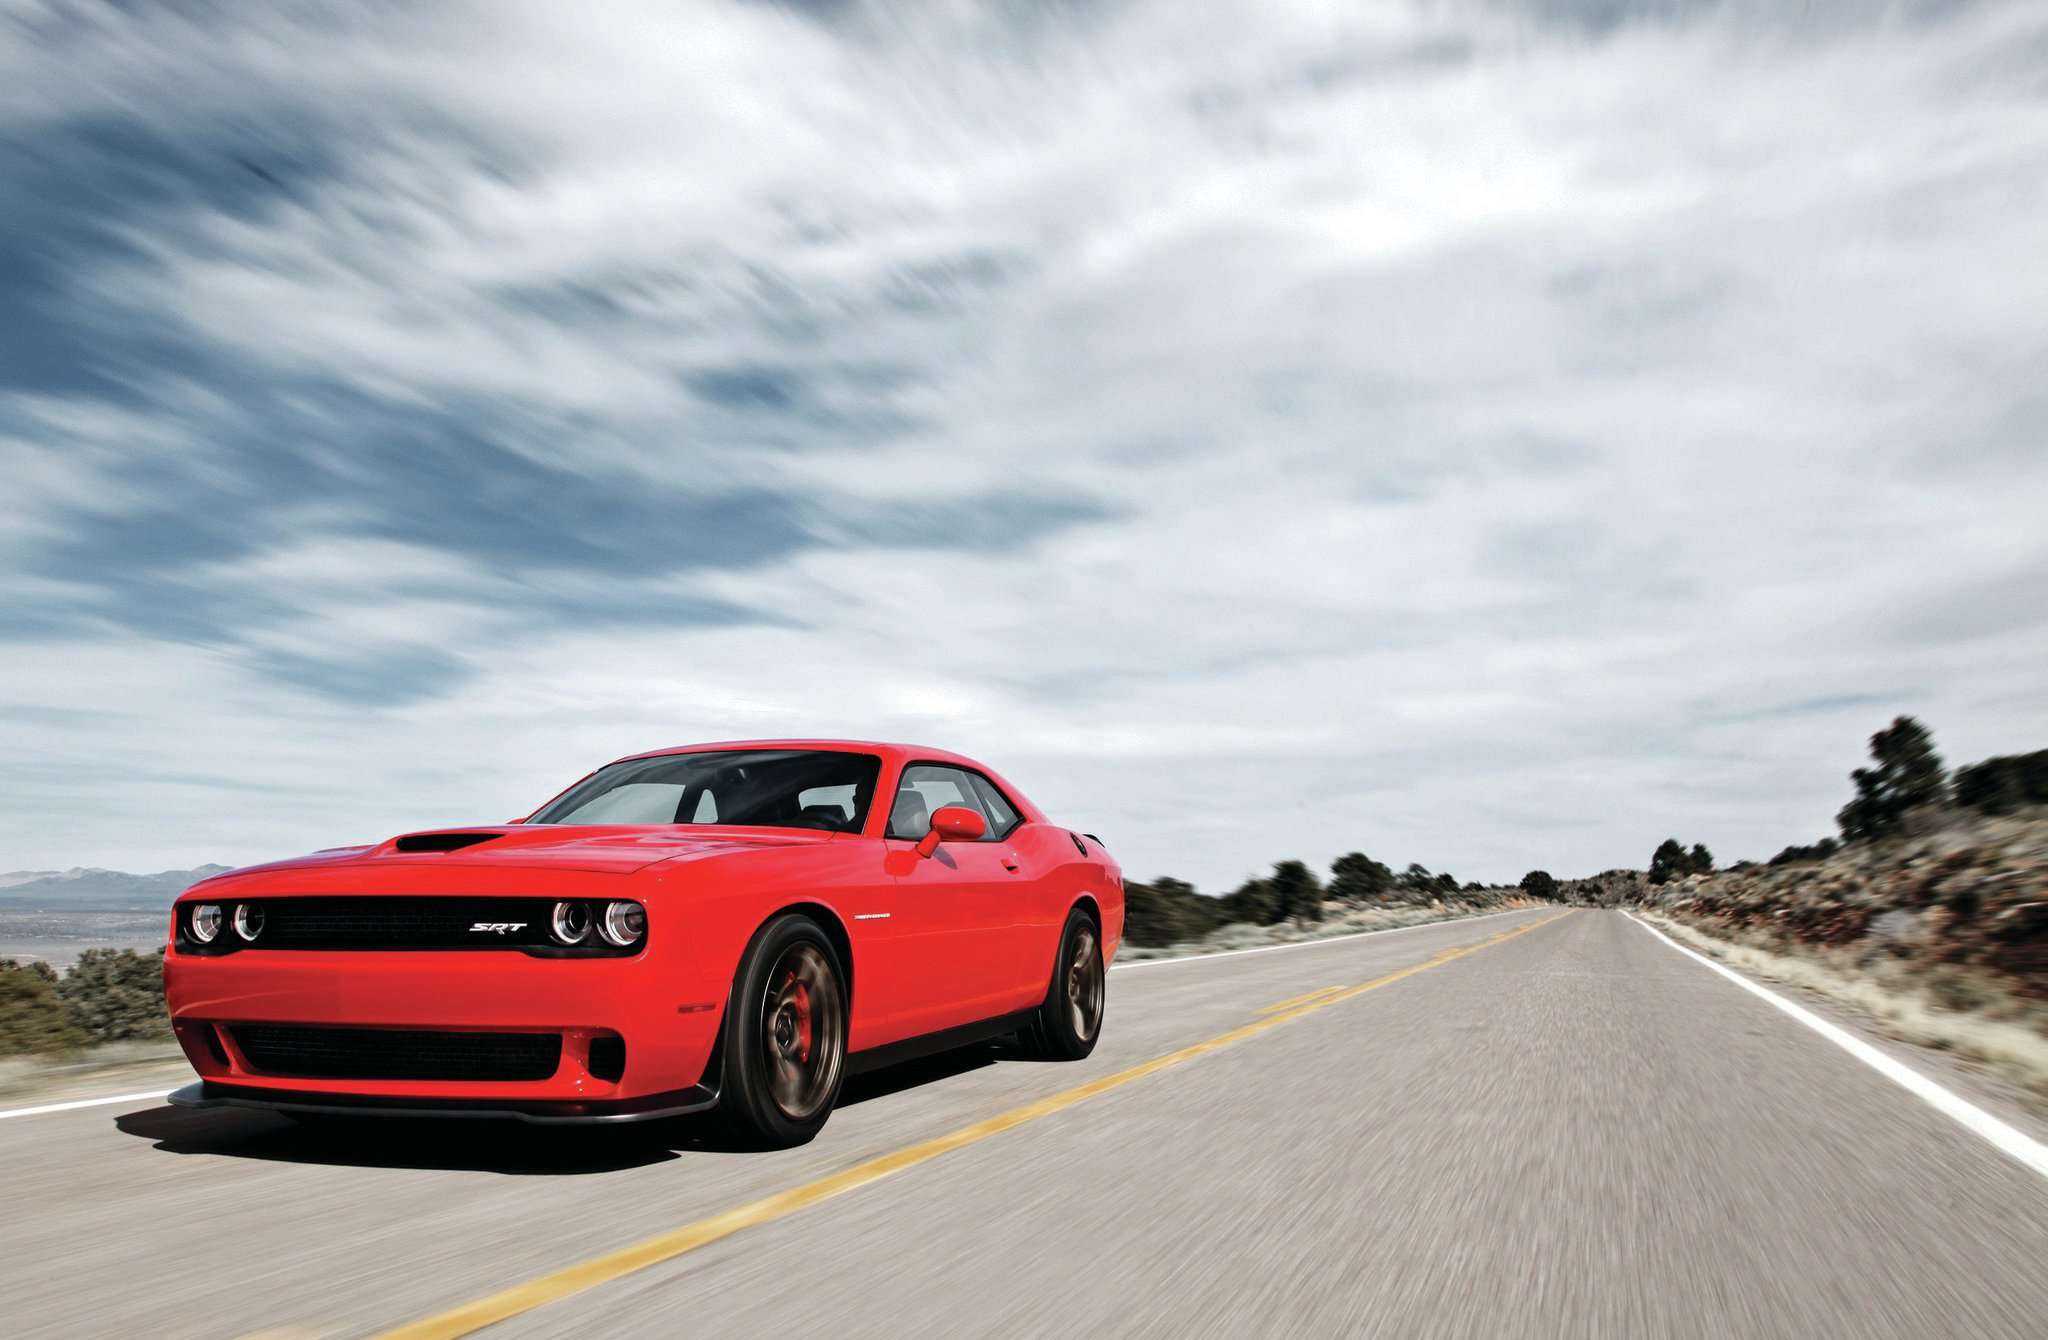 2015 Dodge Challenger Hellcat Front Three Quarter